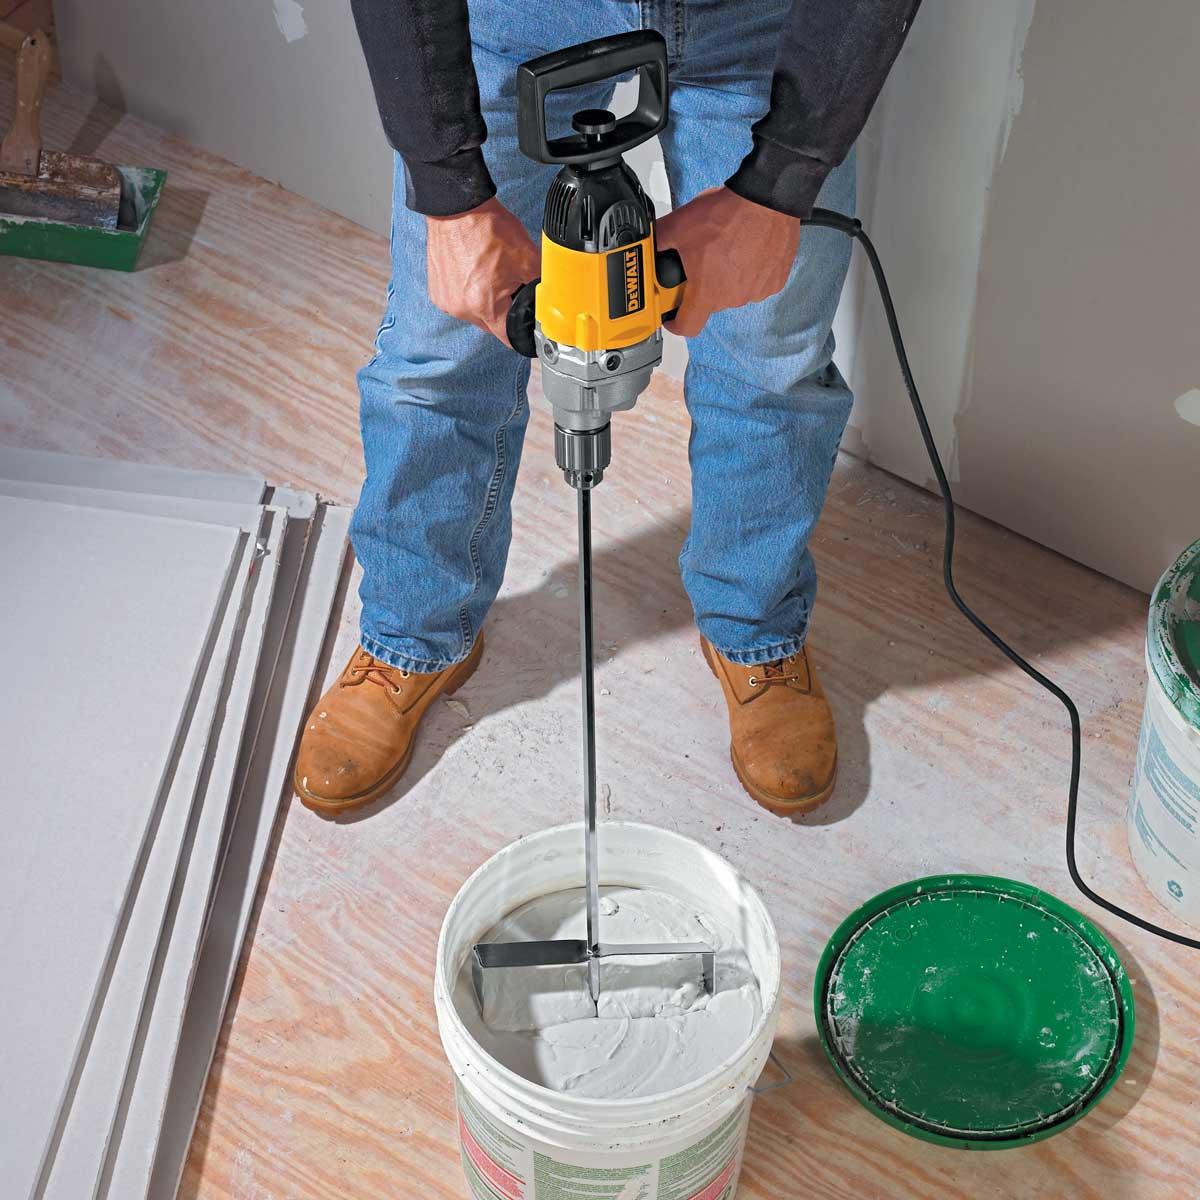 Dewalt DW130V electric mixing drill